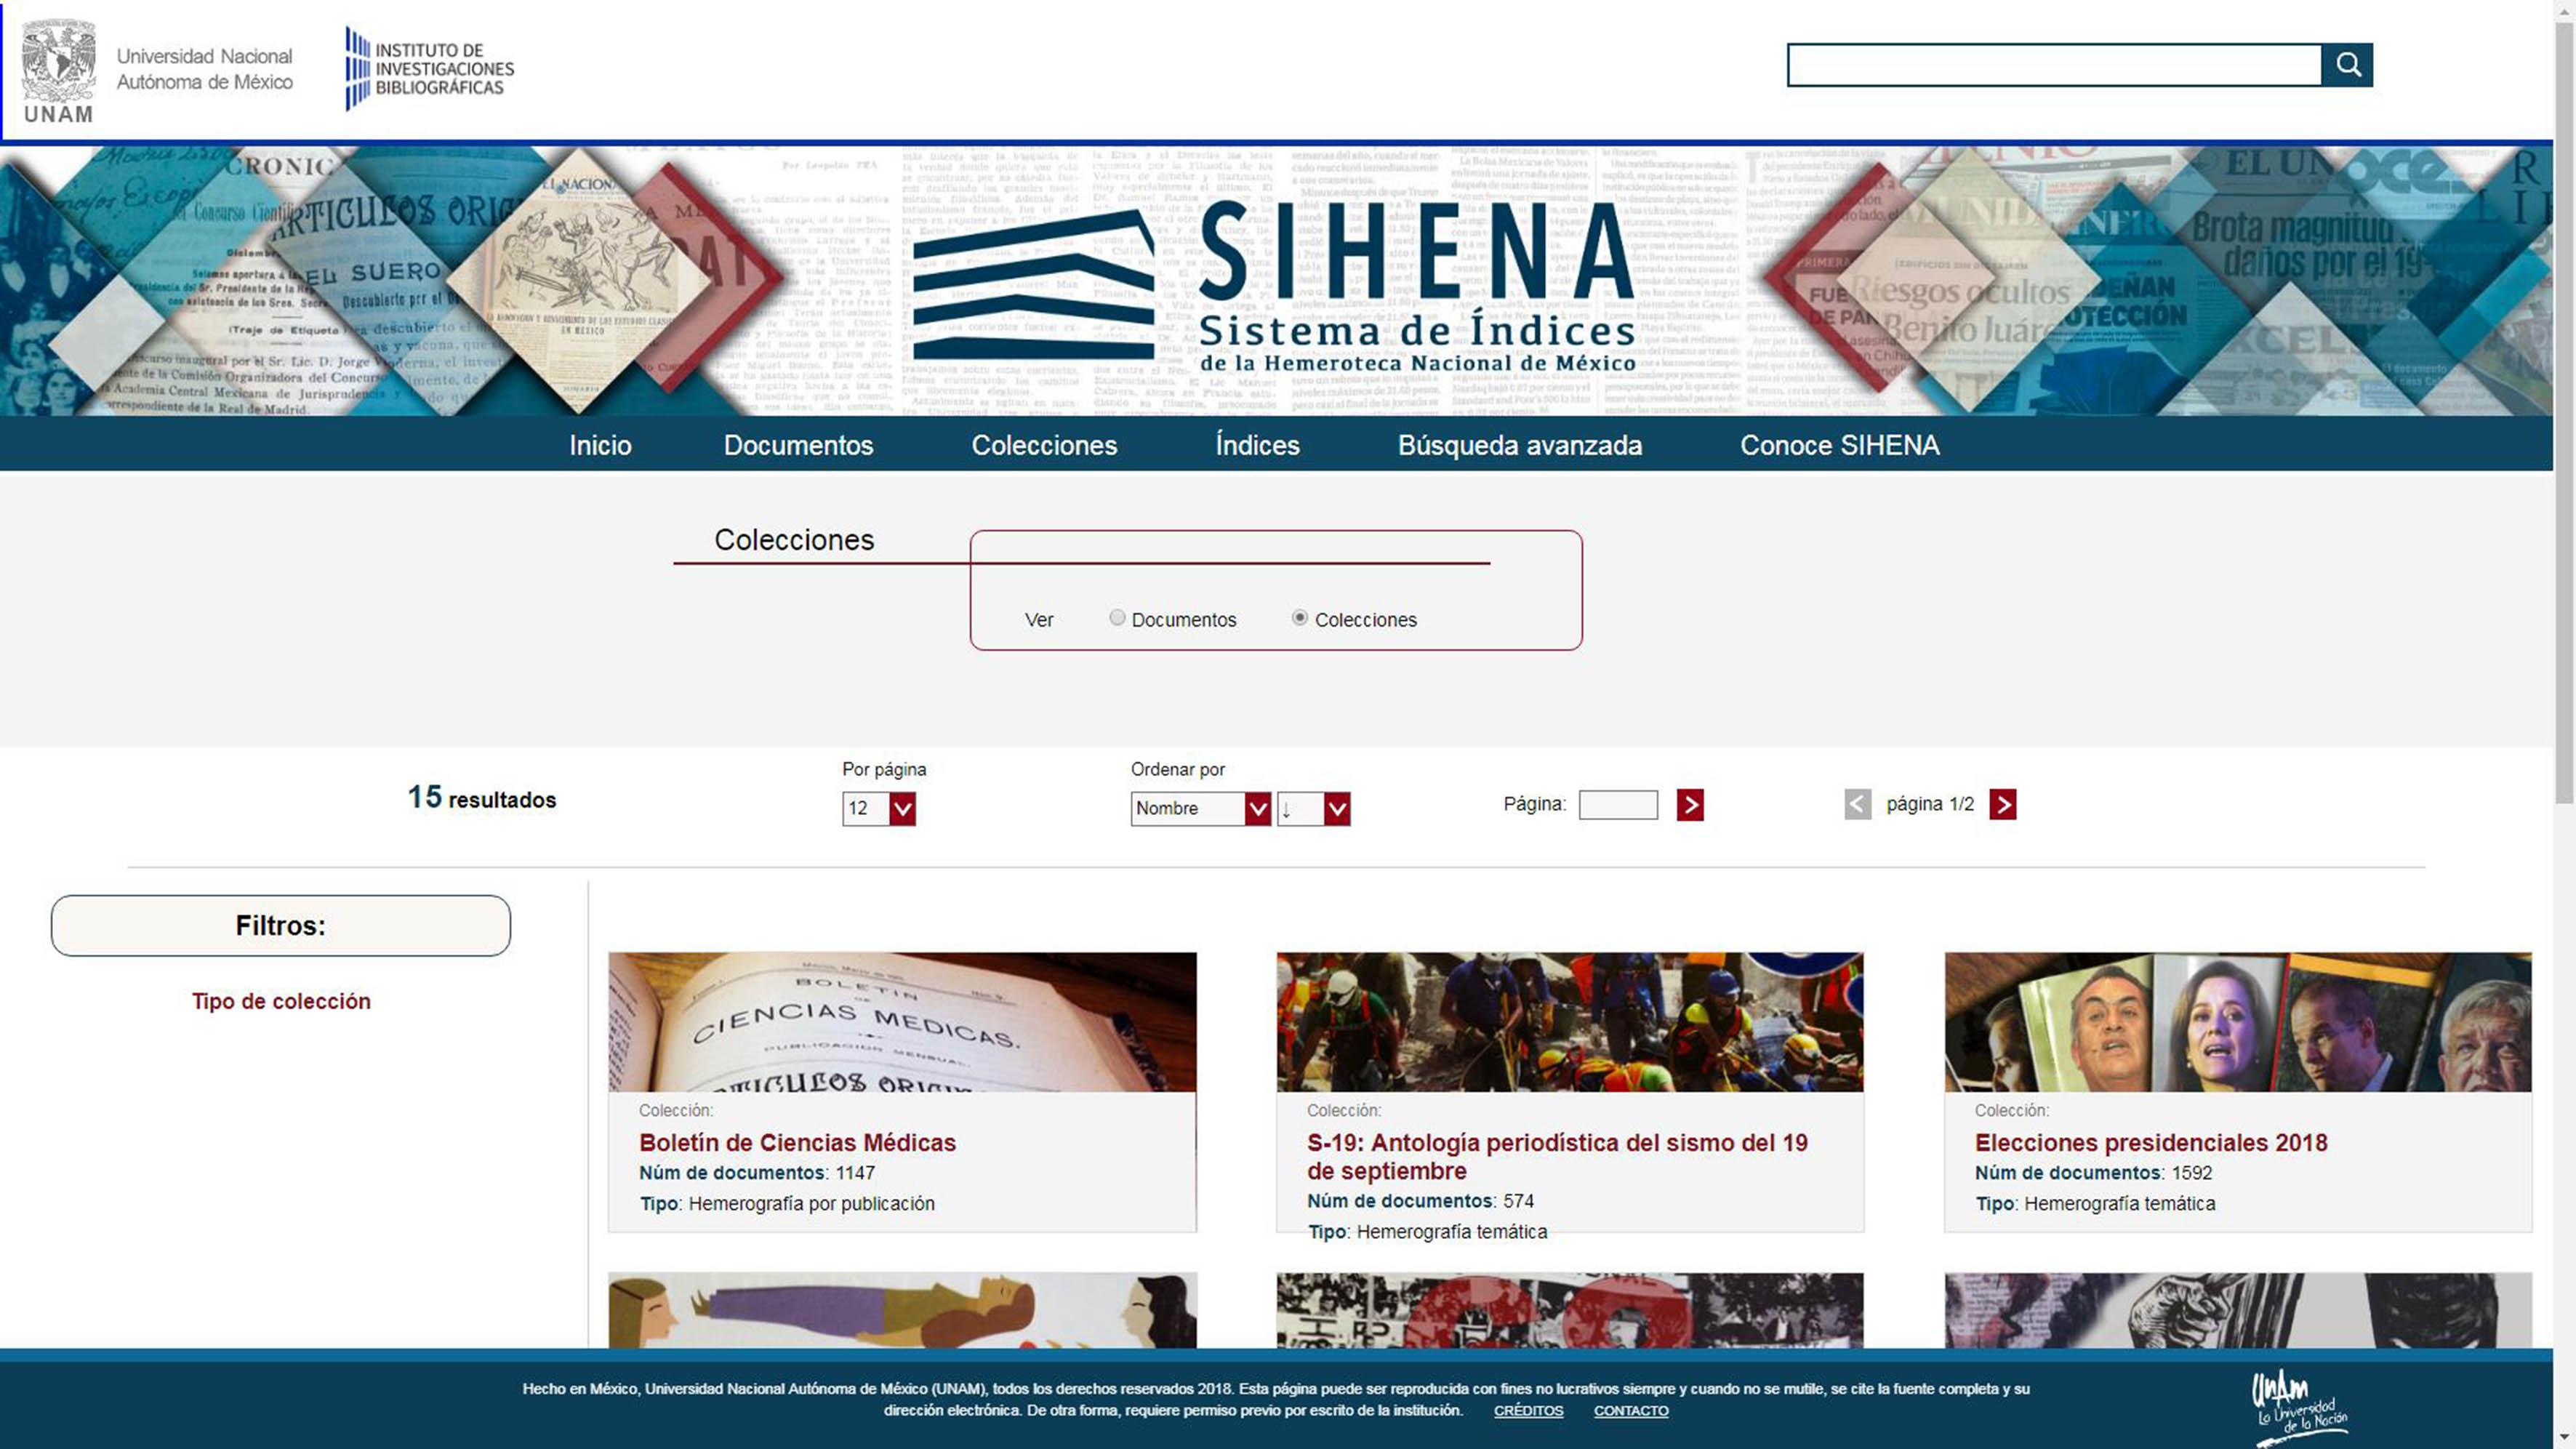 Estrena Hemeroteca Nacional de la UNAM Plataforma Digital